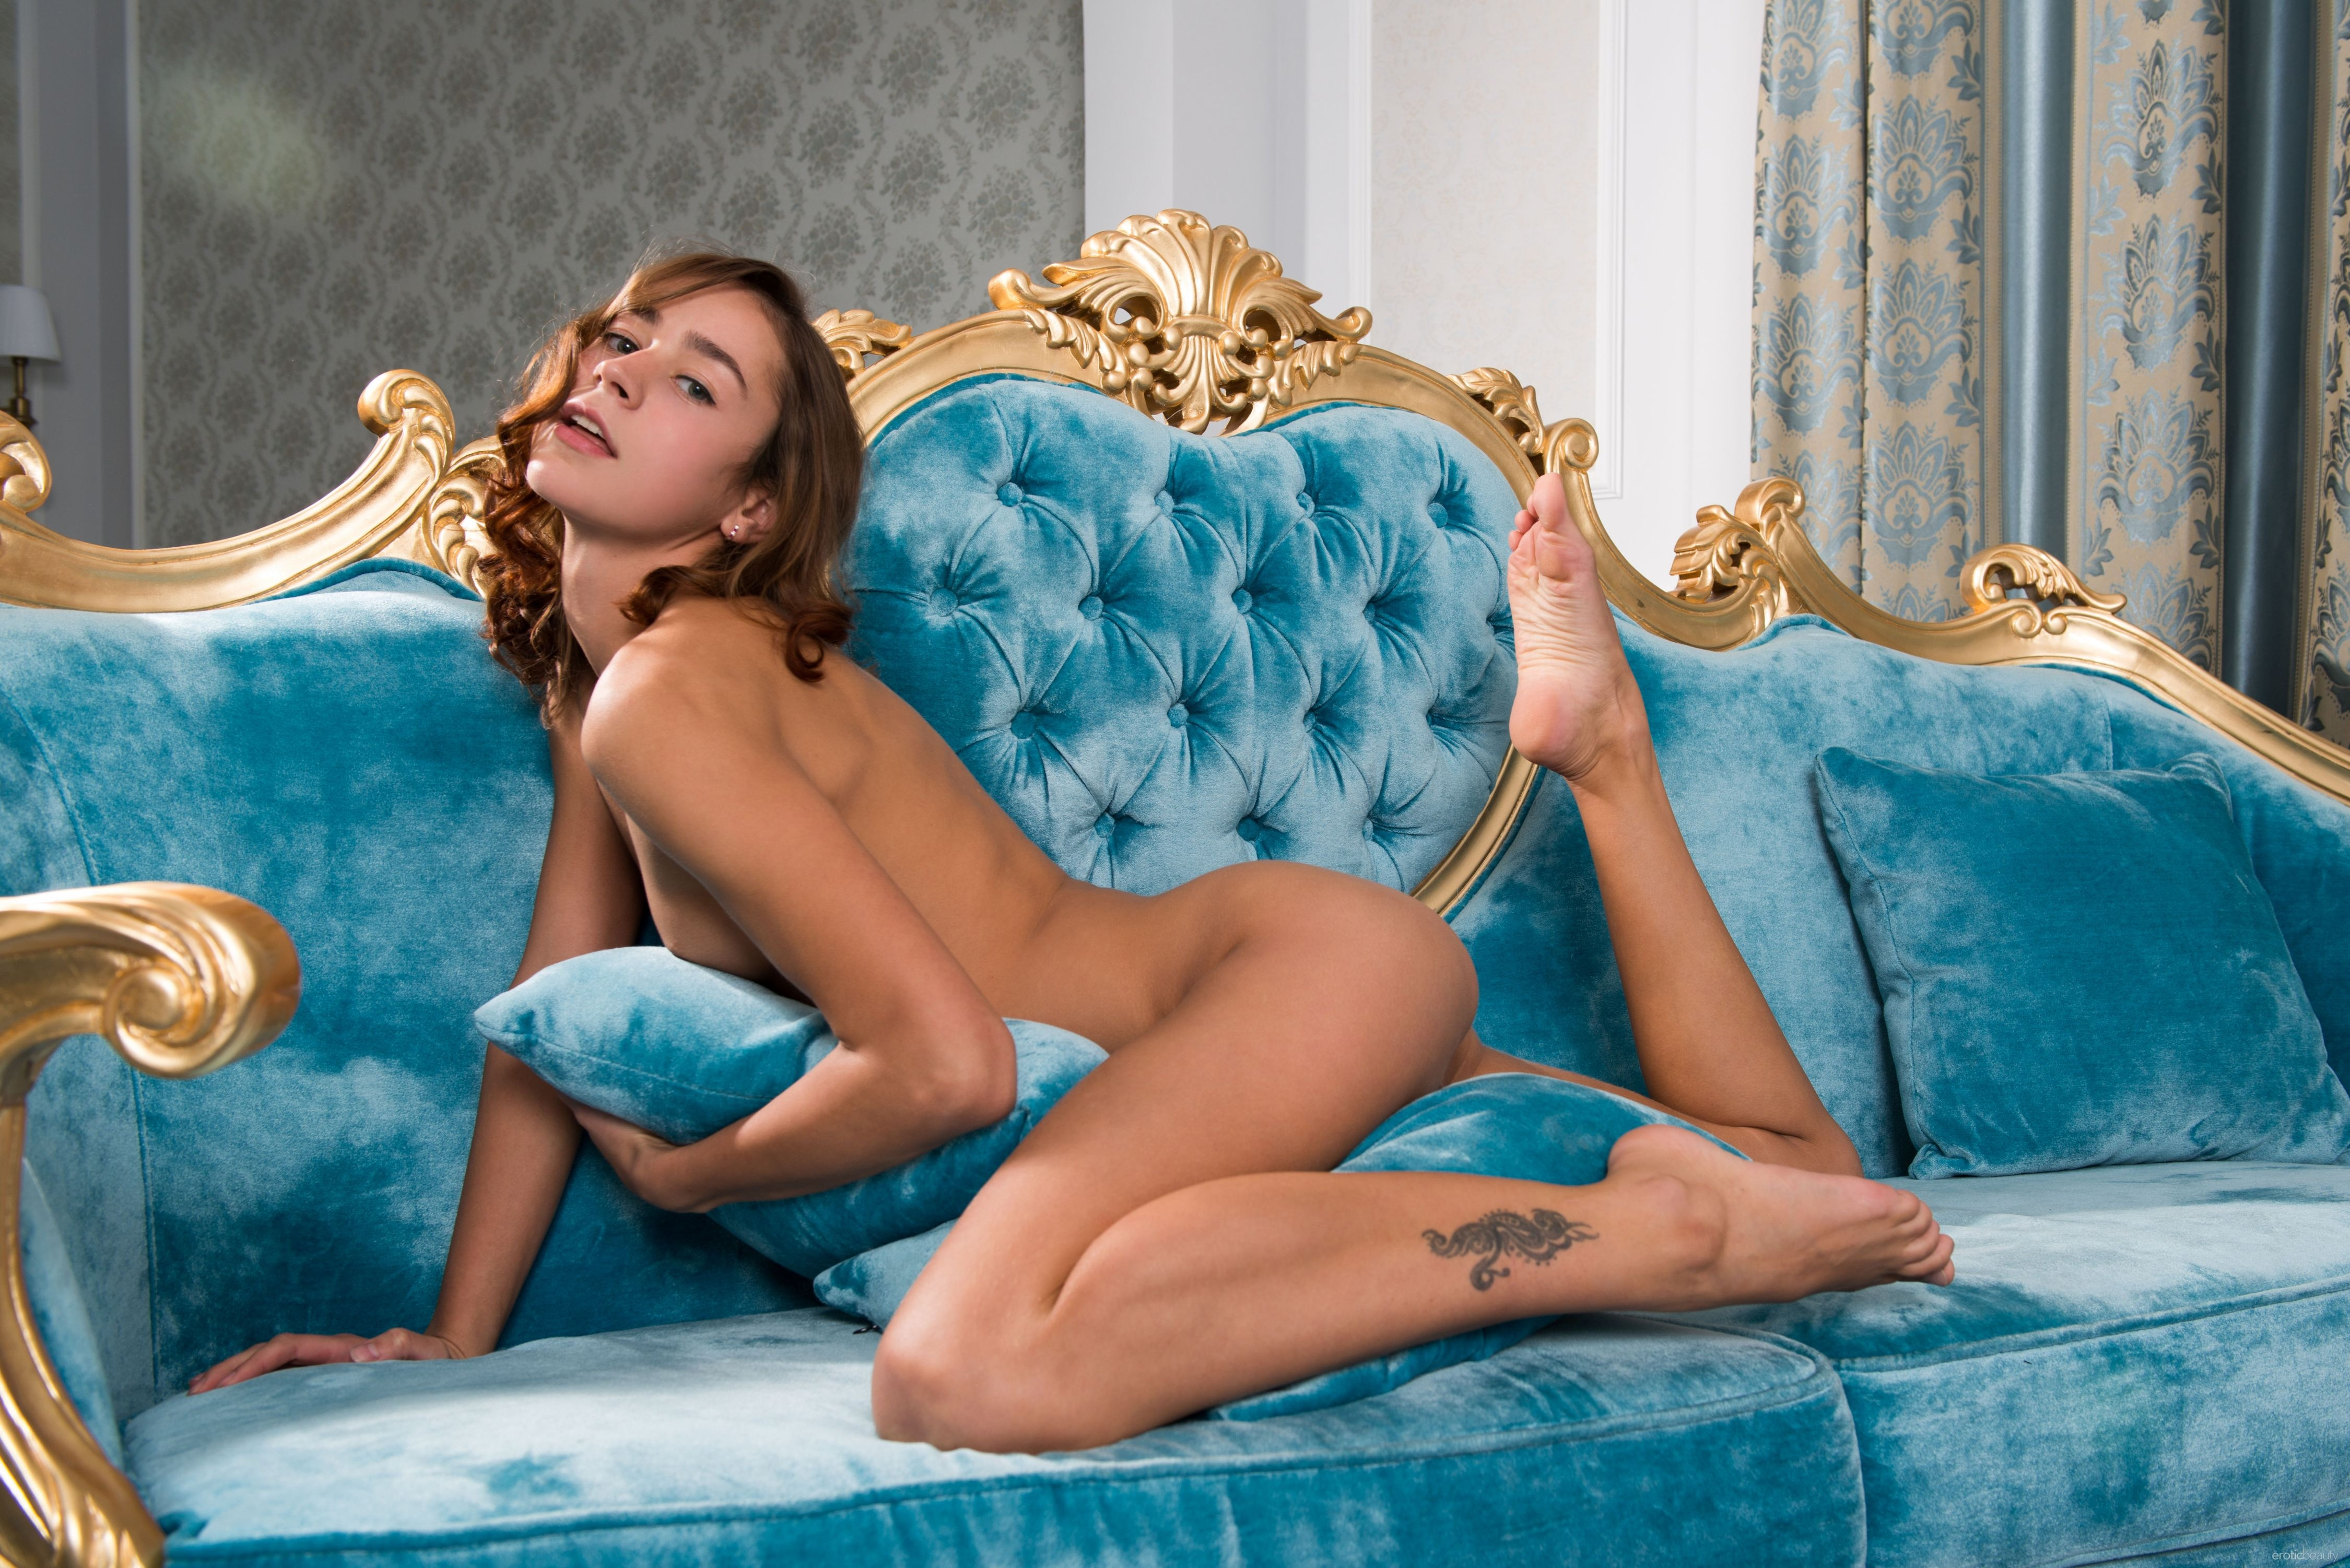 Luana lani nude strips